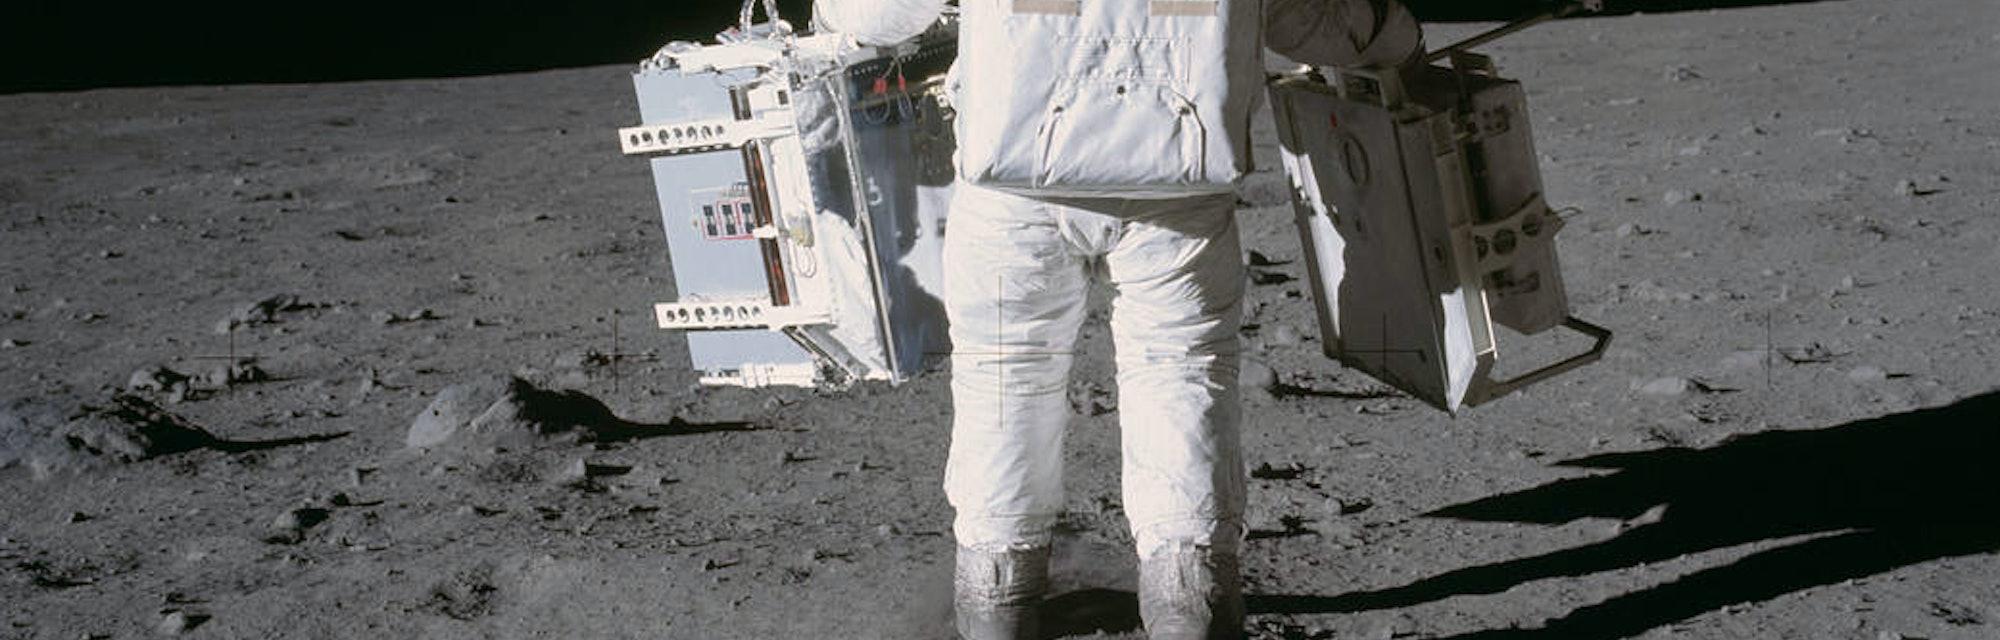 NASA astronaut hiking on the Moon